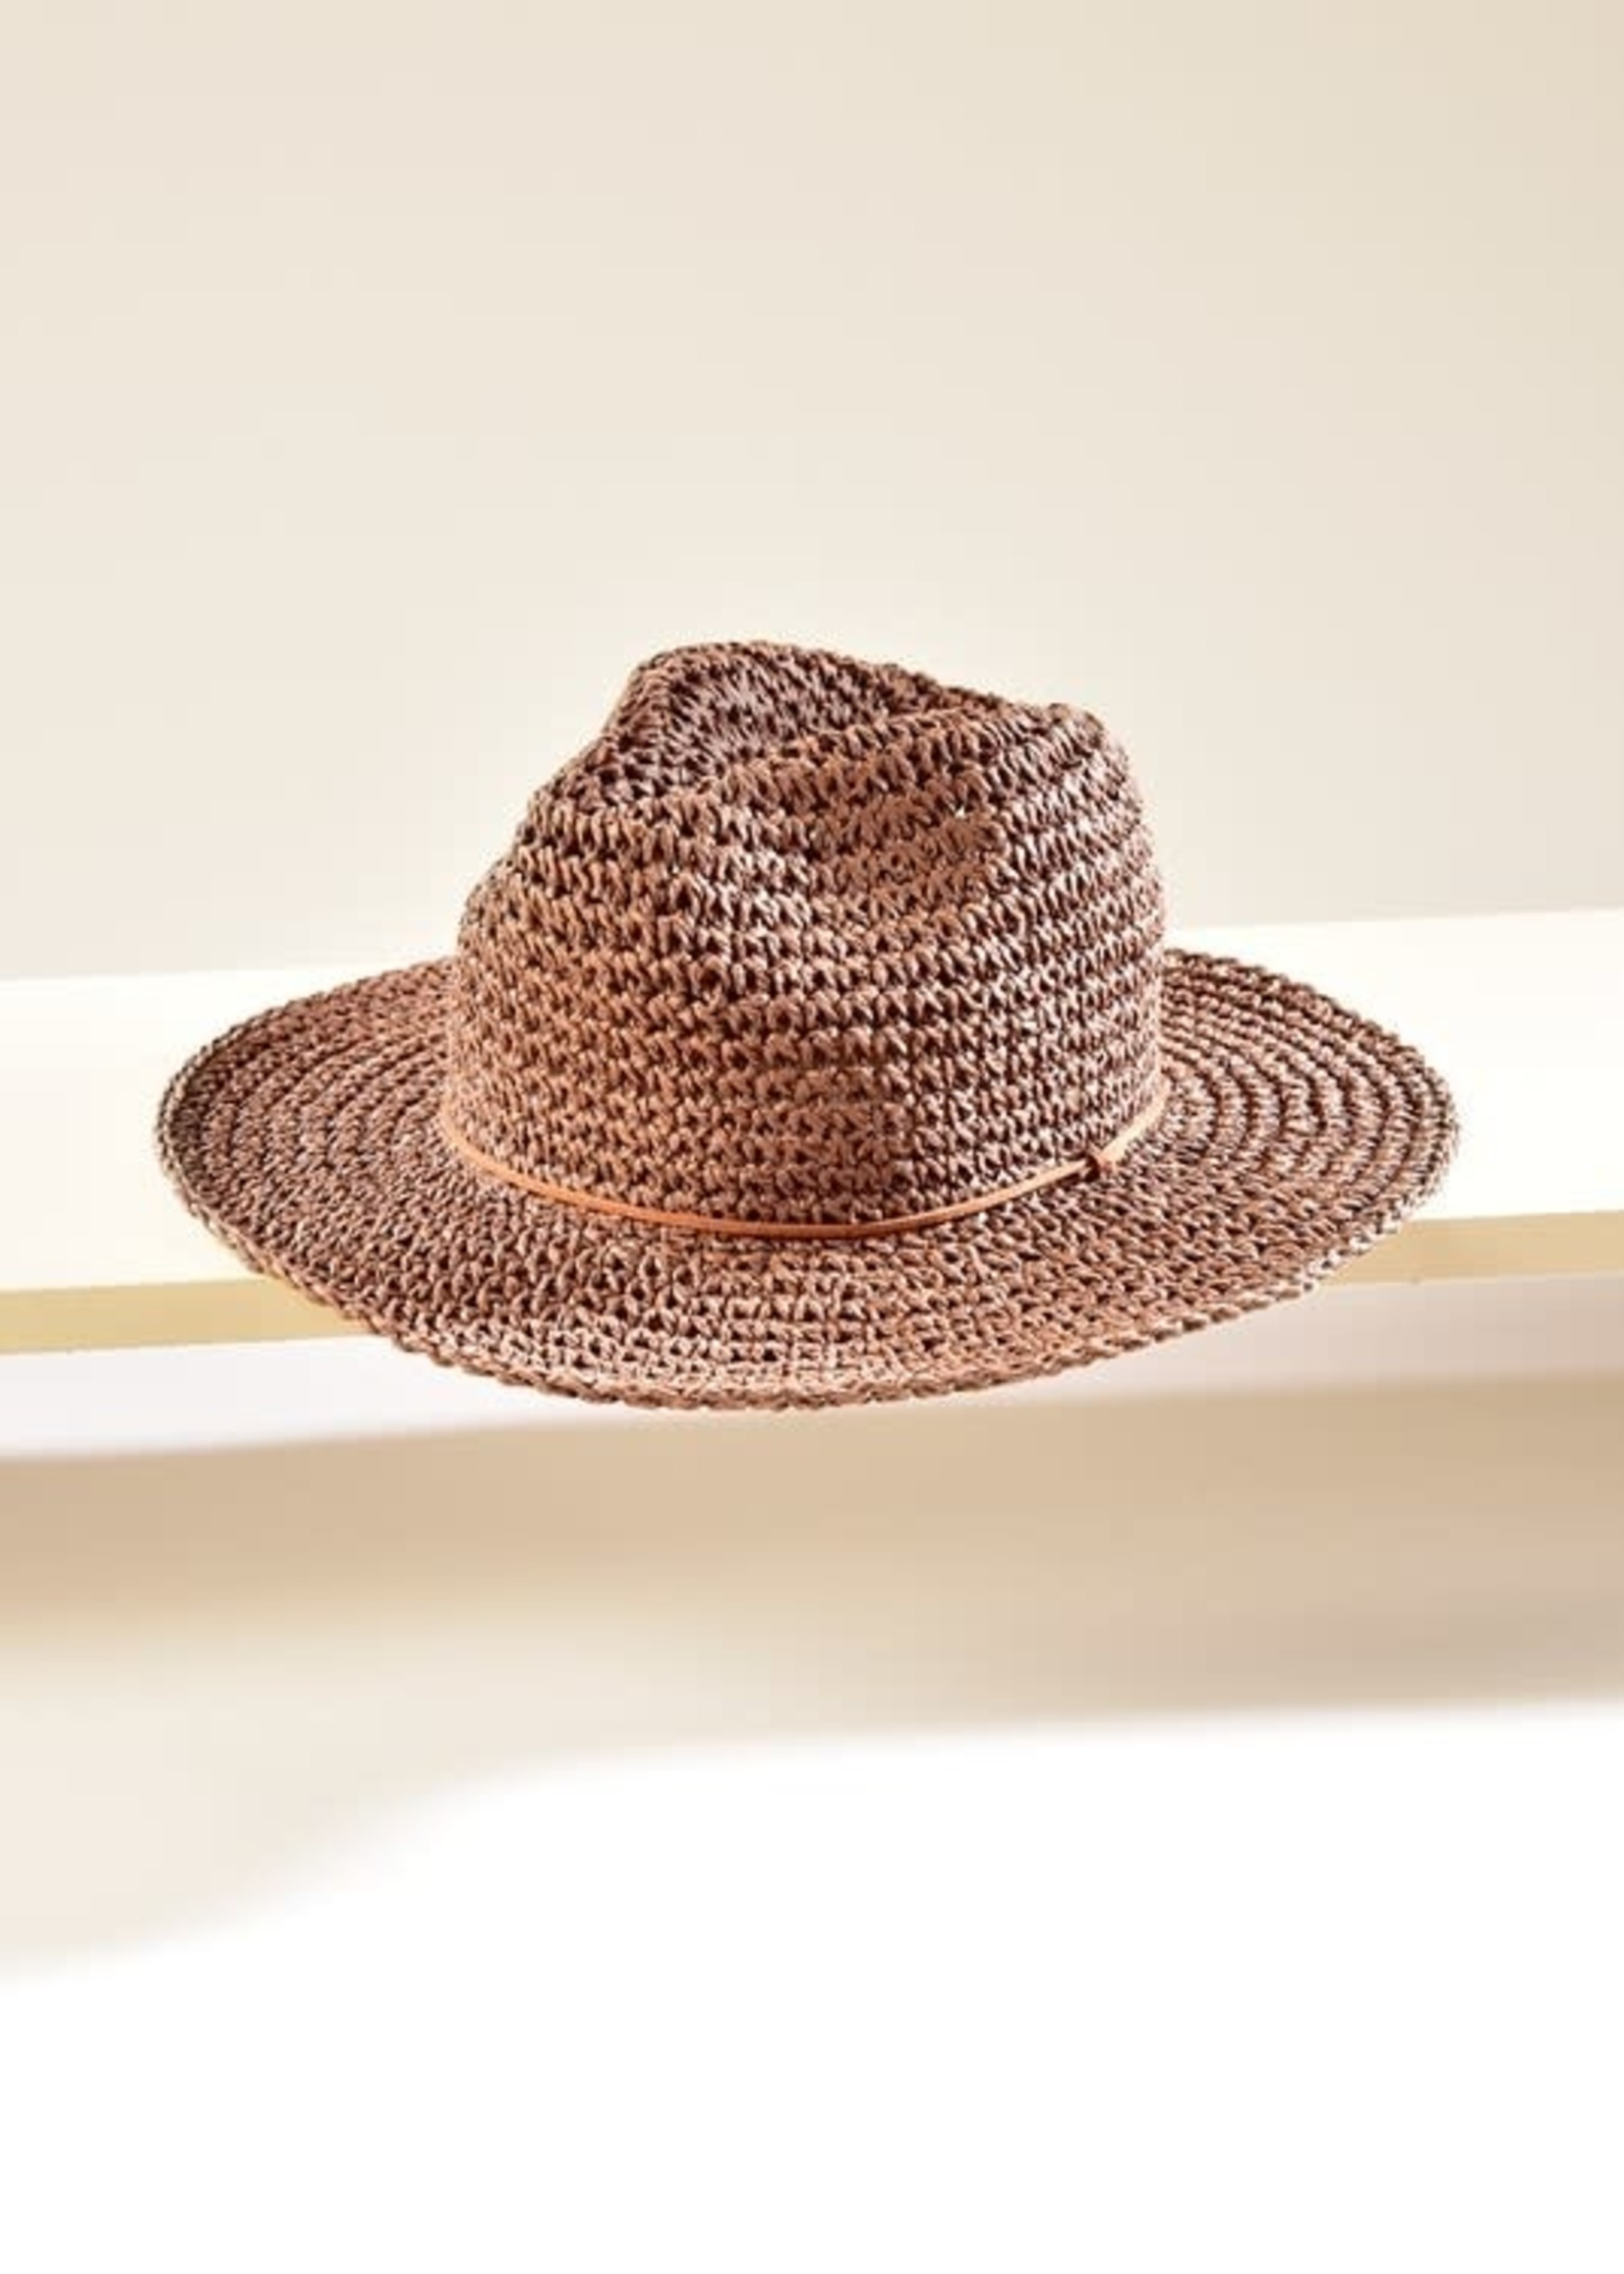 Charlie Paige CP - Panama Hat